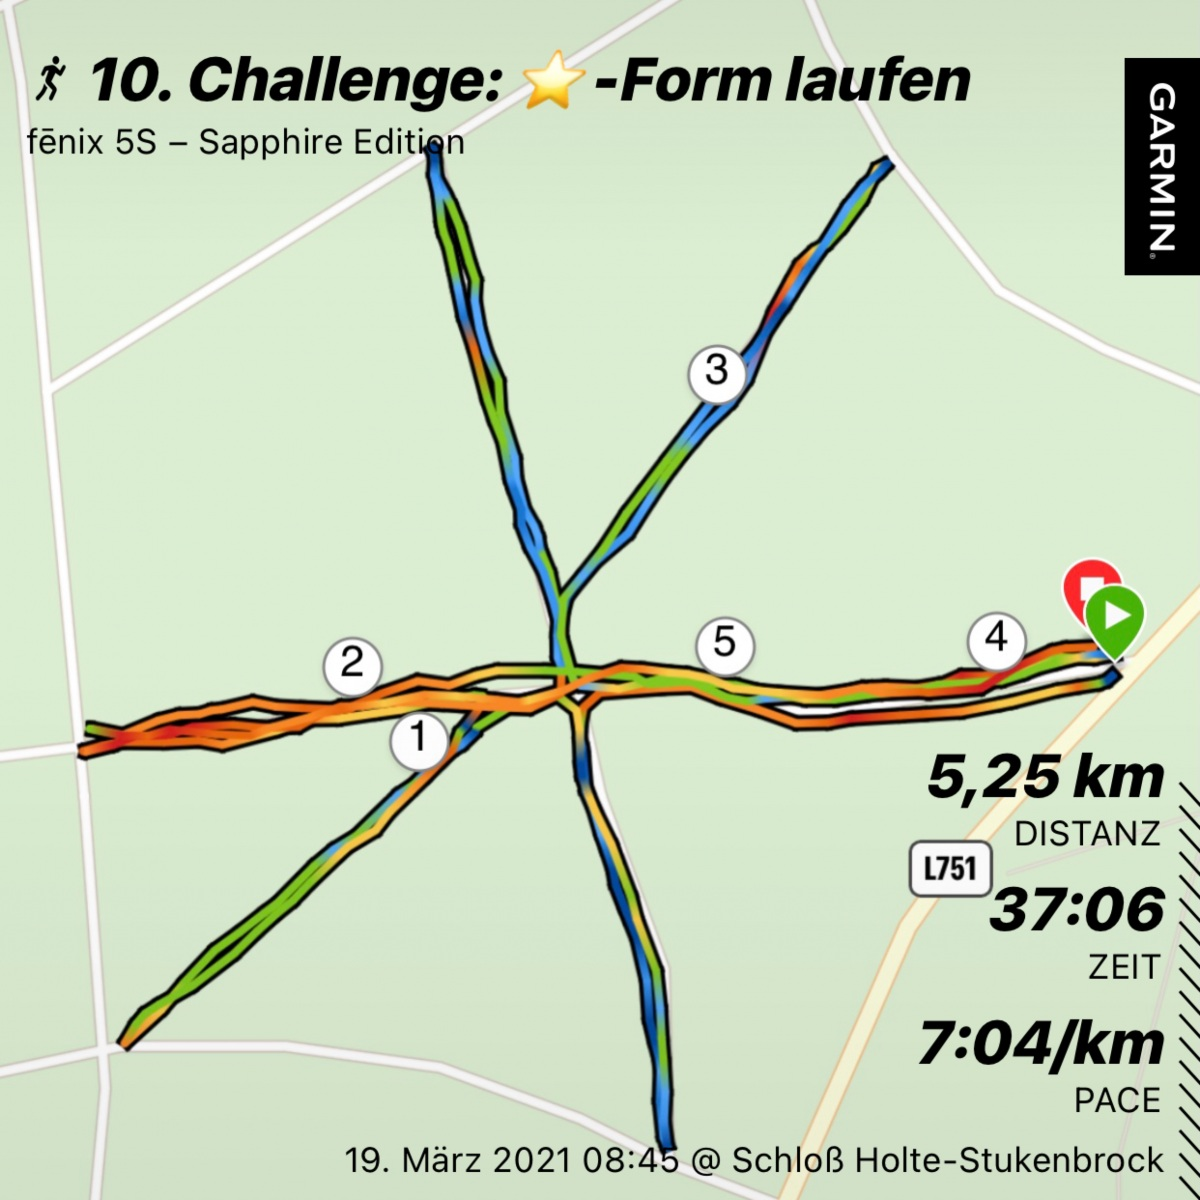 Hassenewert-Eva-10-Challenge-Stern-Form-KCotm